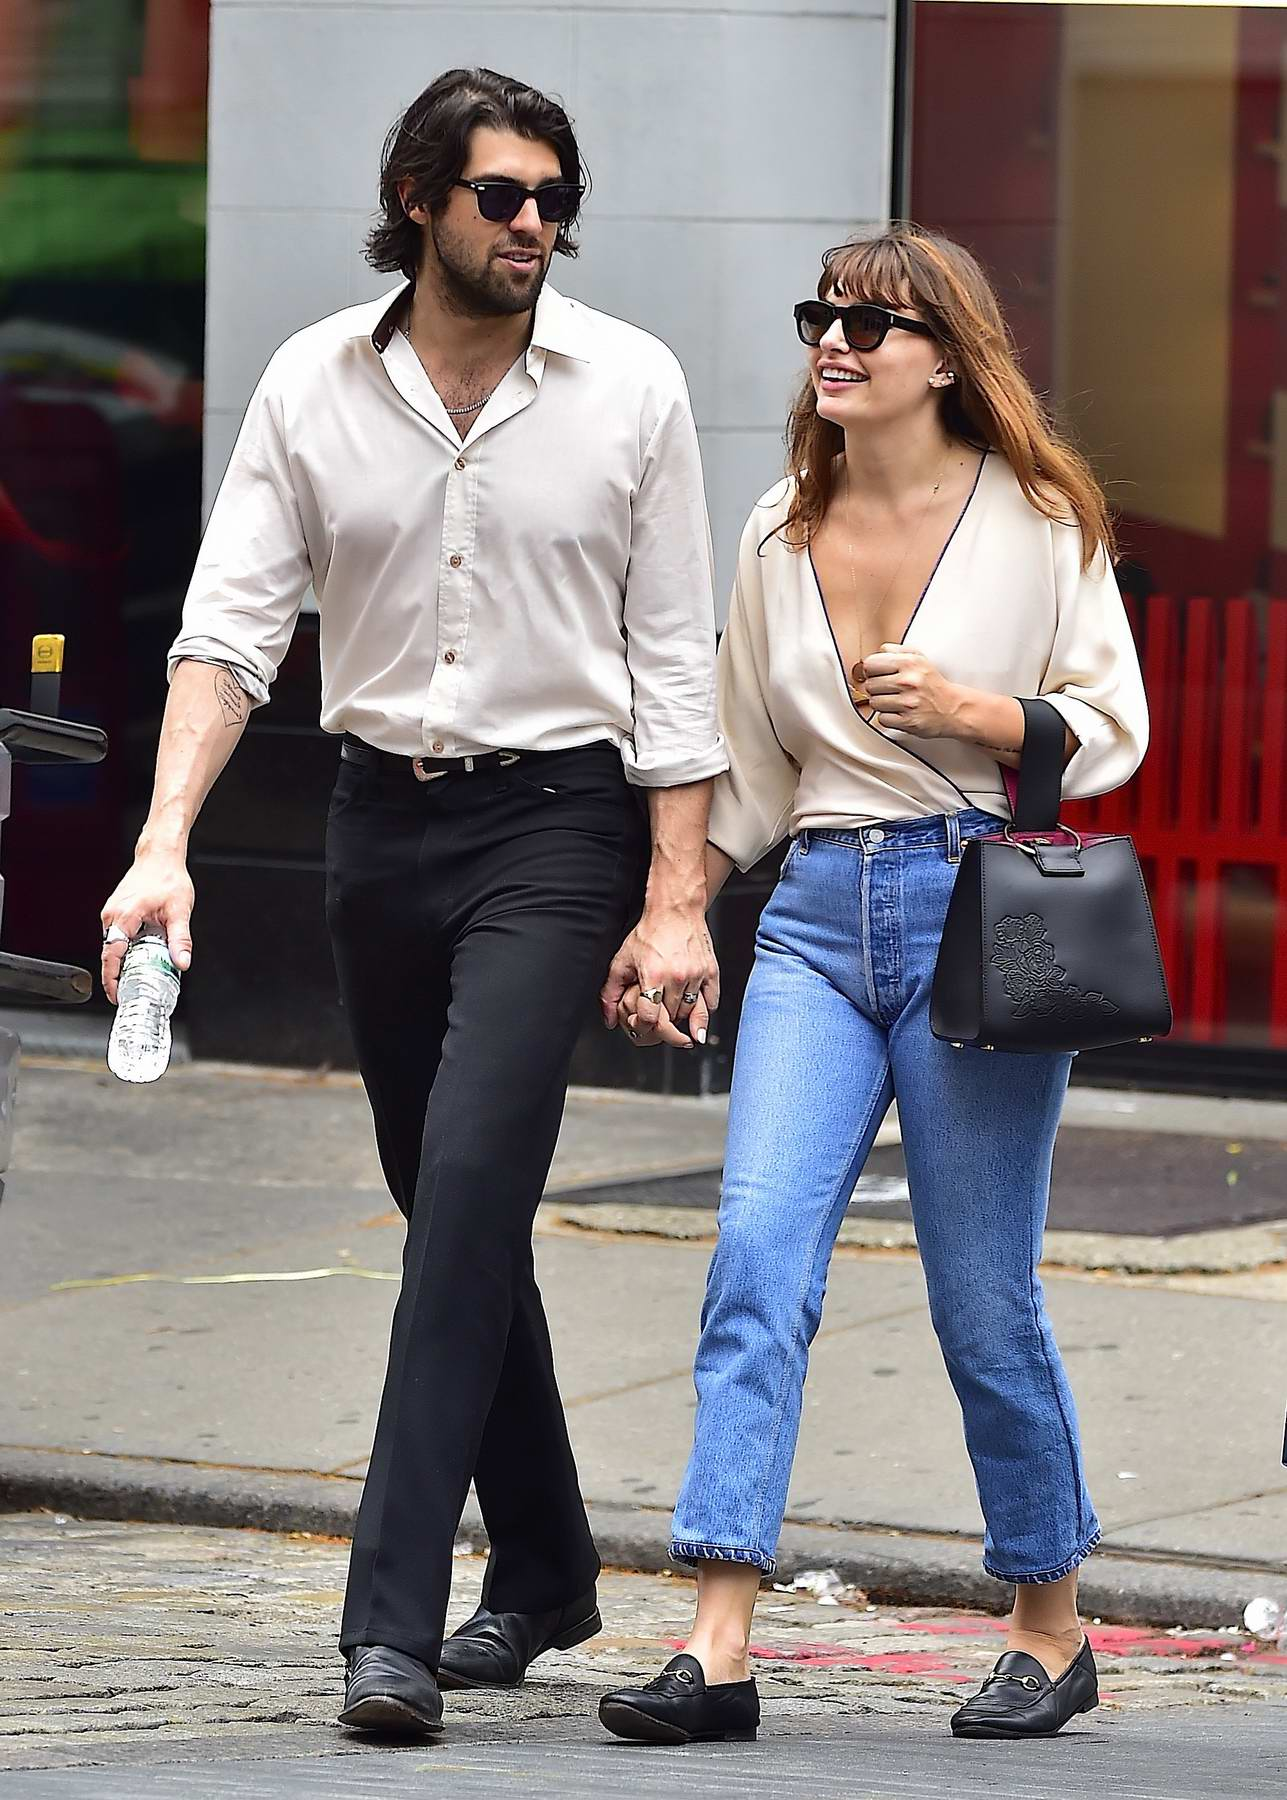 Alyssa Miller is seen with her new boyfriend enjoying a nice walk in SoHo, New York City